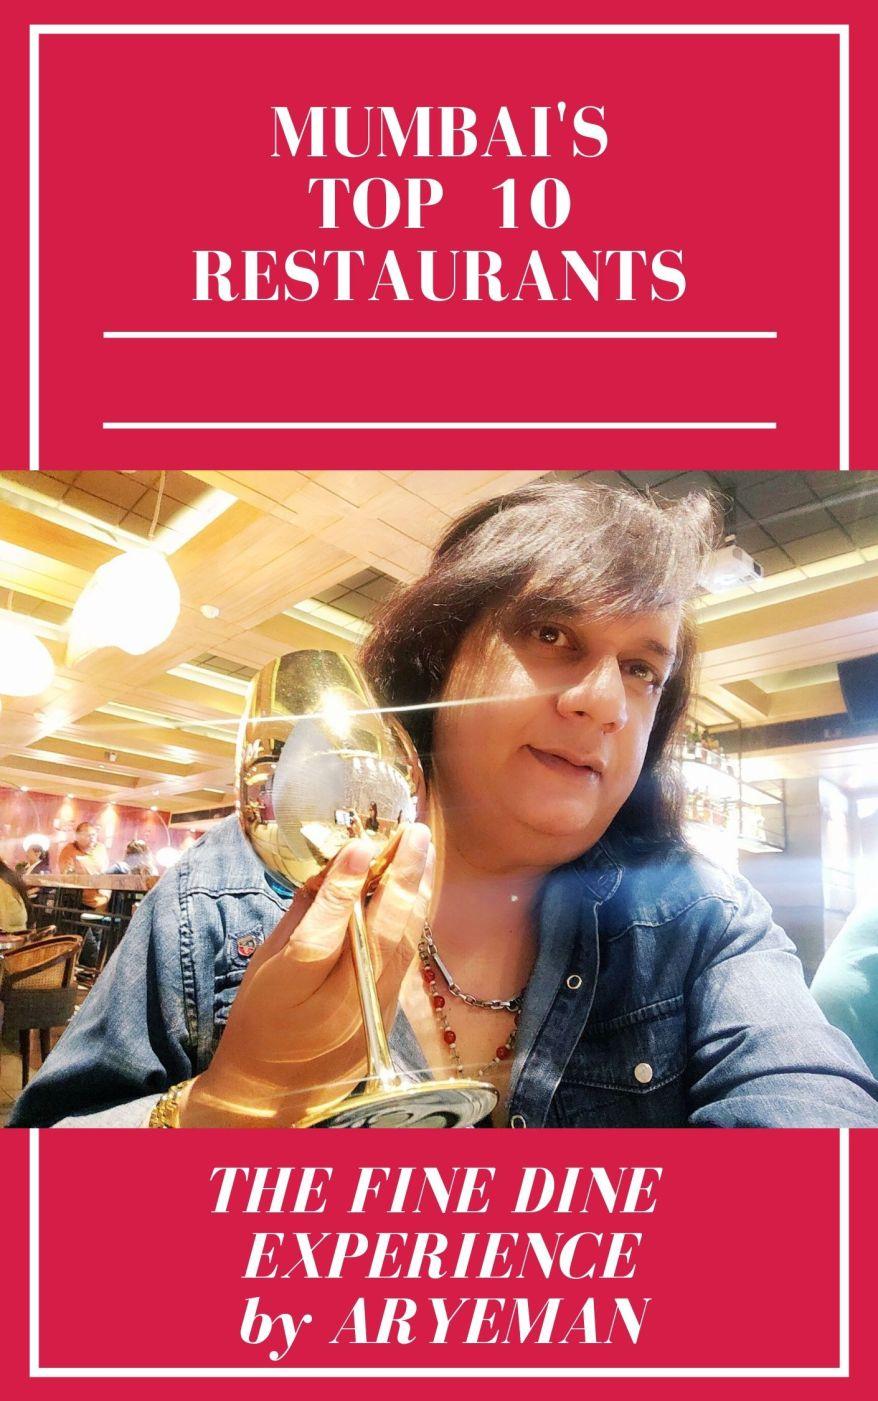 Mumbais Top 10 Restaurants